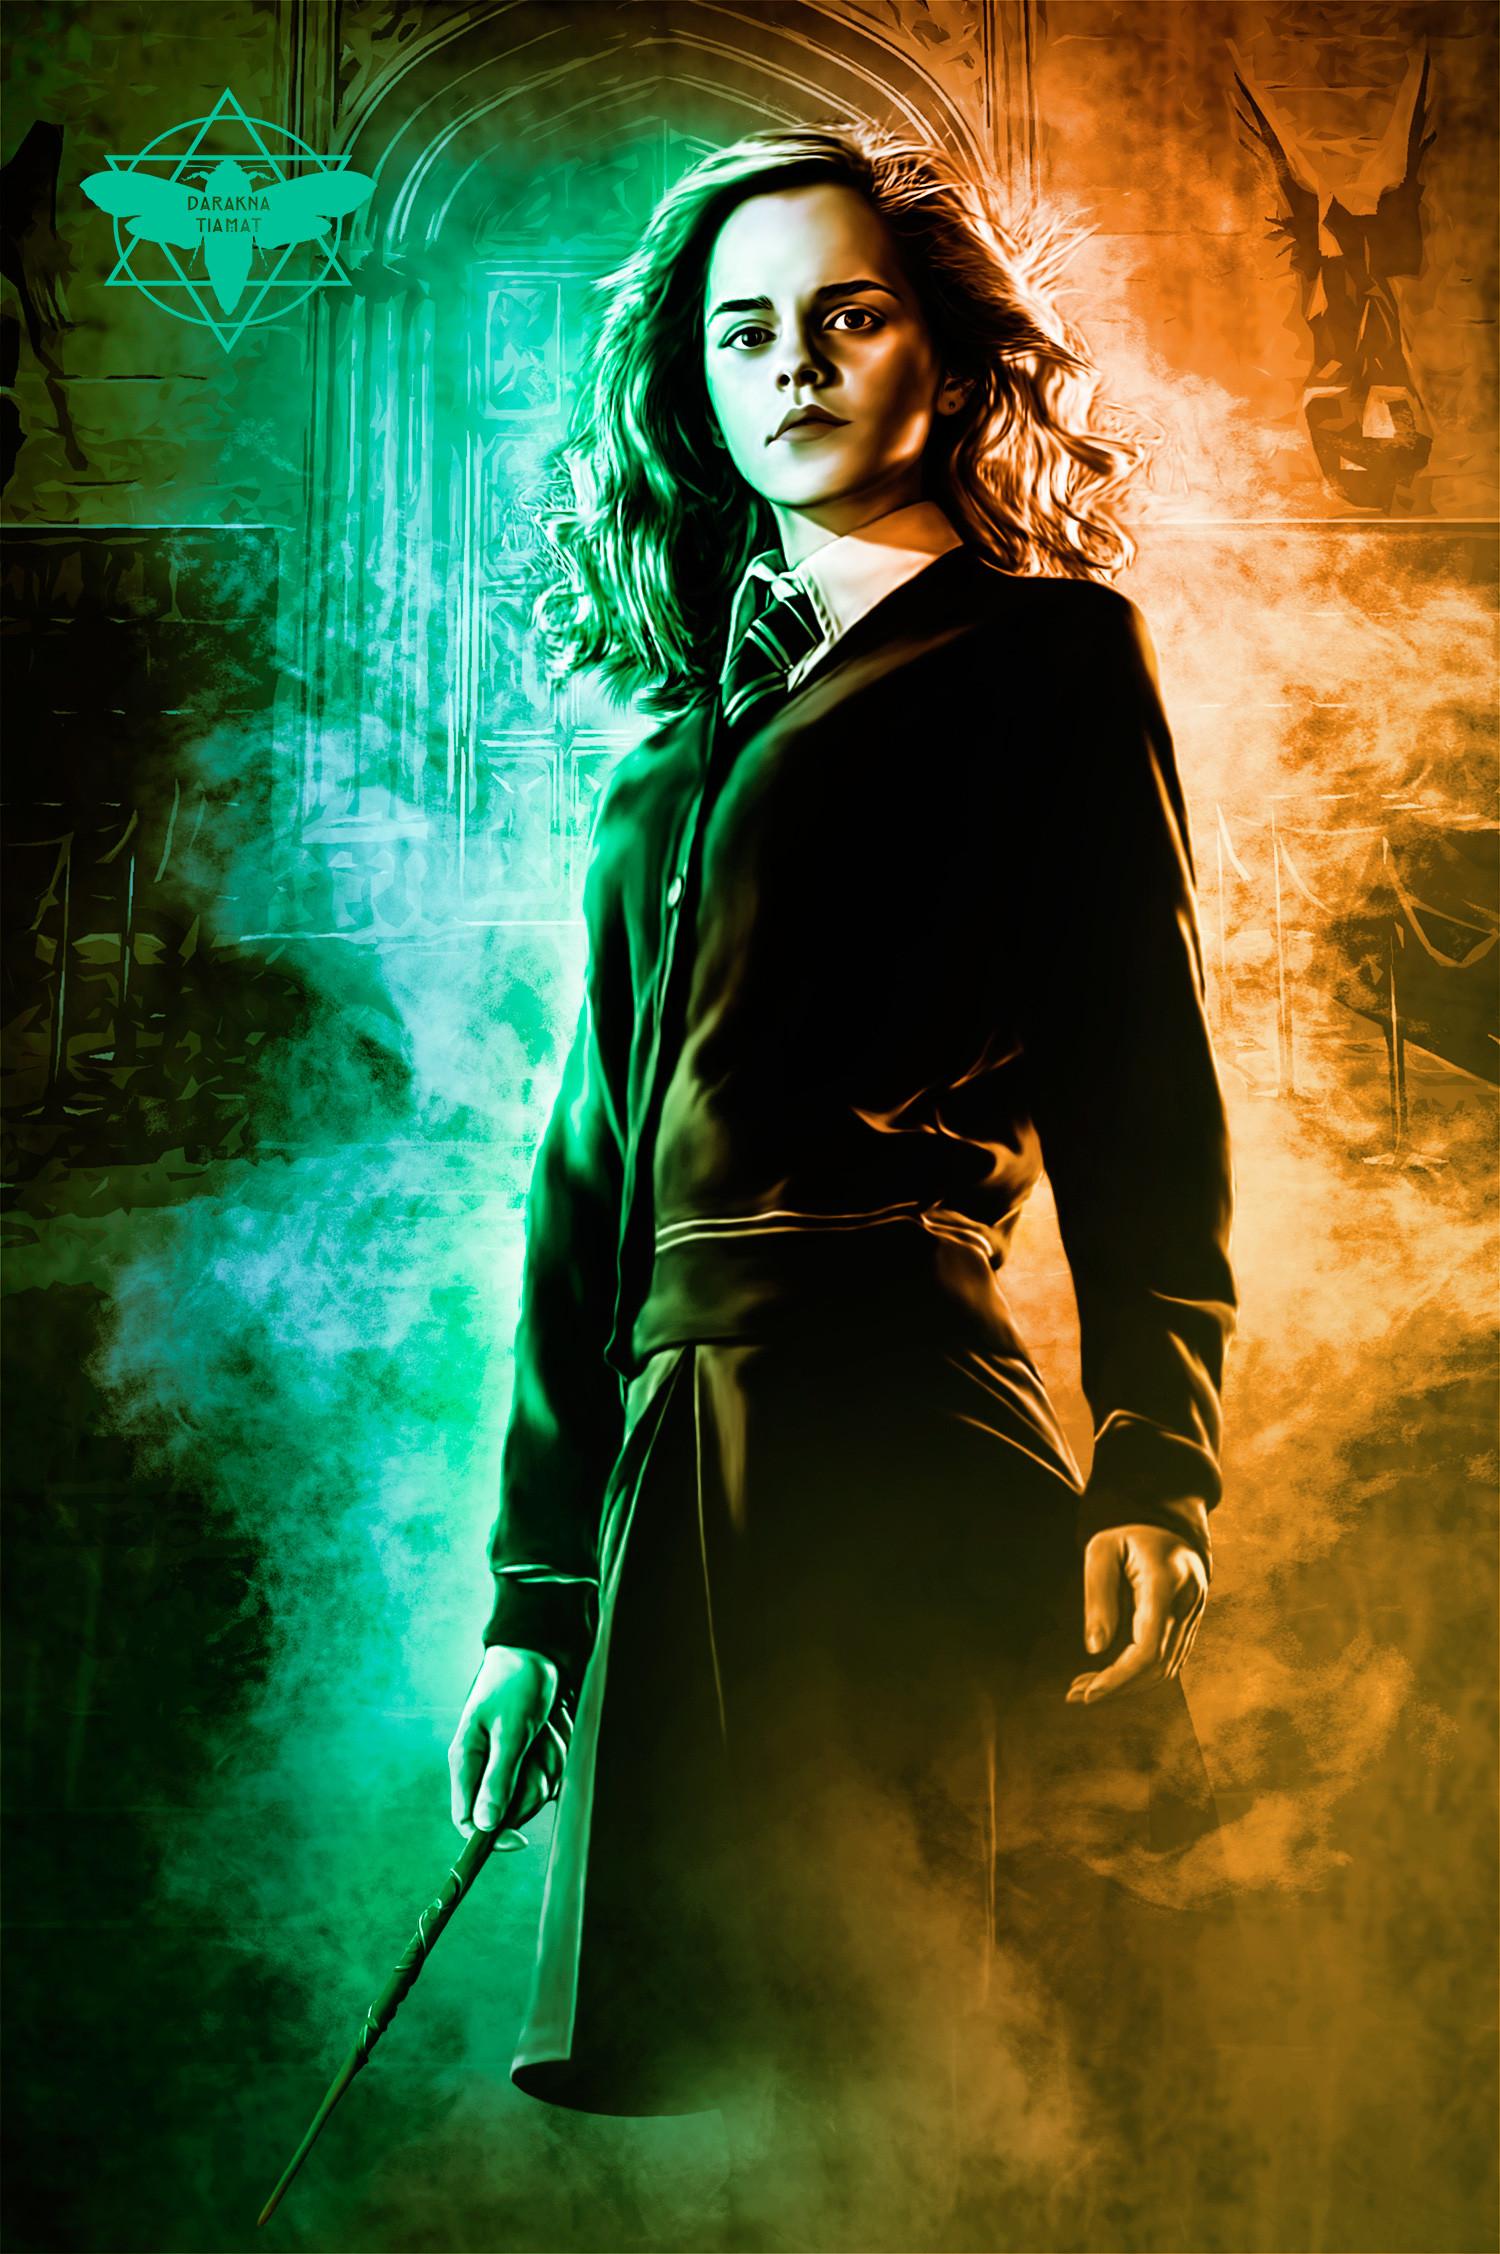 Darakna Tiamat Emma Watson As Hermione Granger